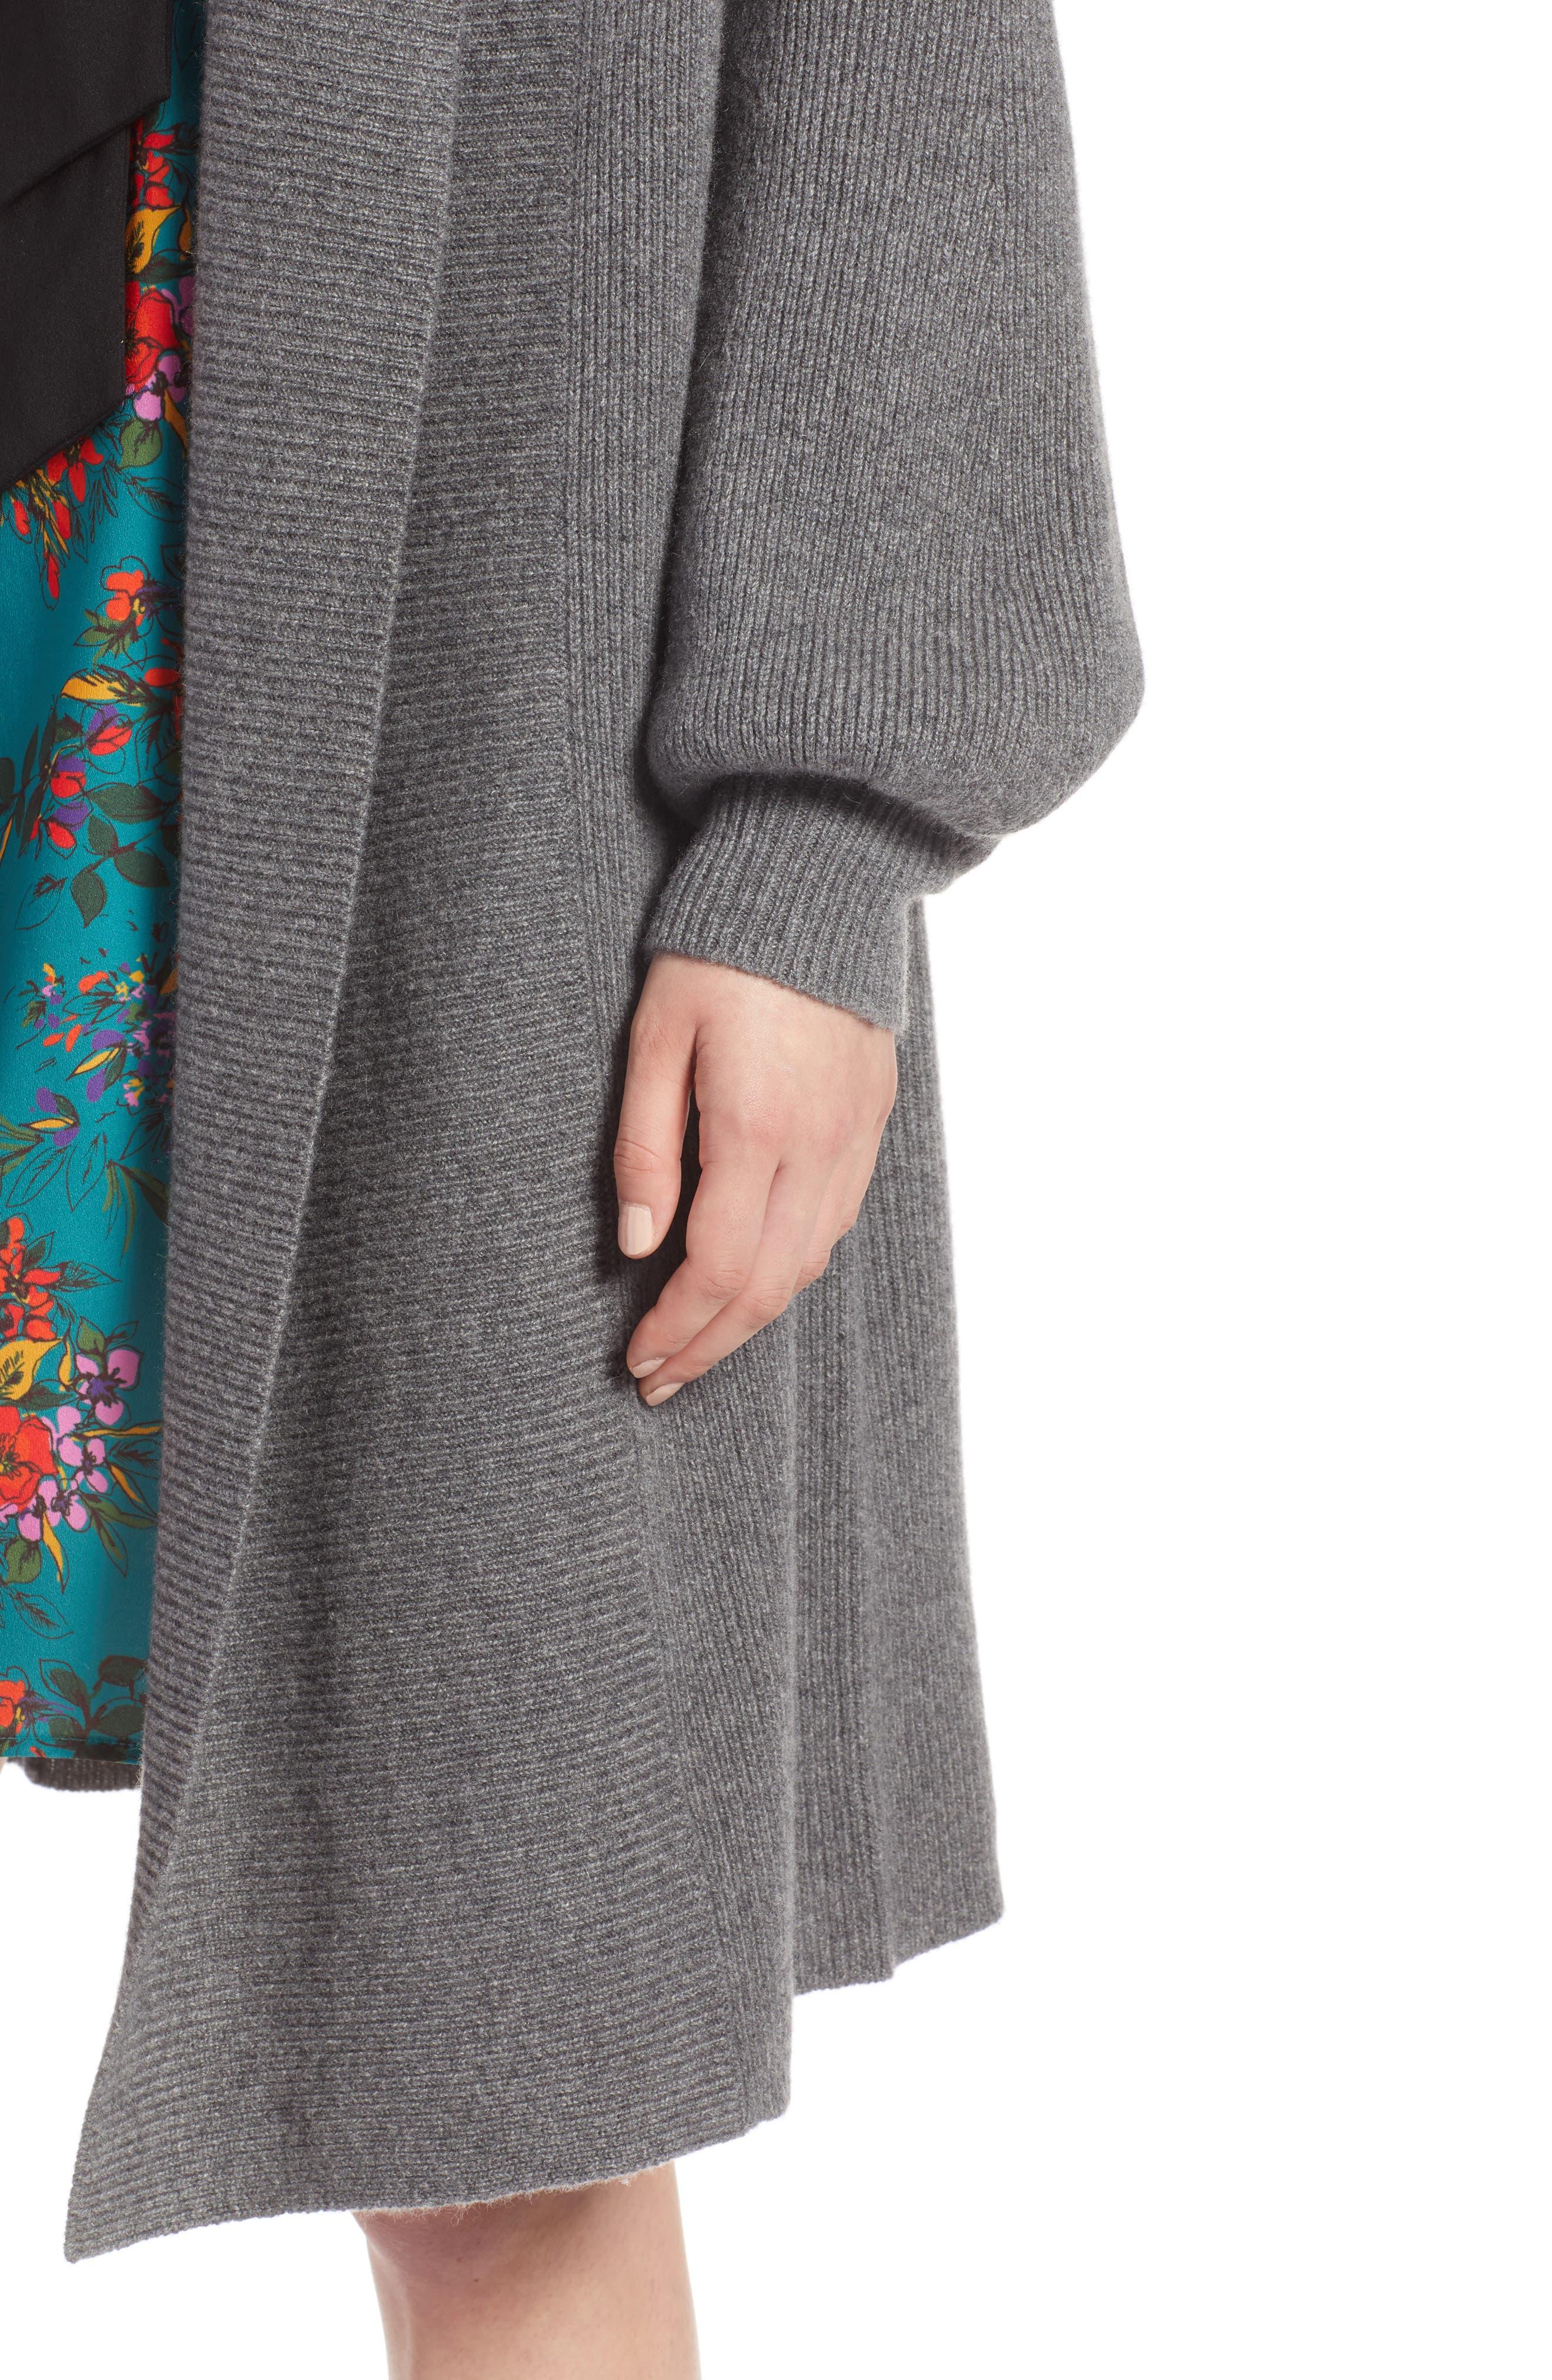 Blouson Sleeve Long Cashmere Cardigan,                             Alternate thumbnail 4, color,                             032